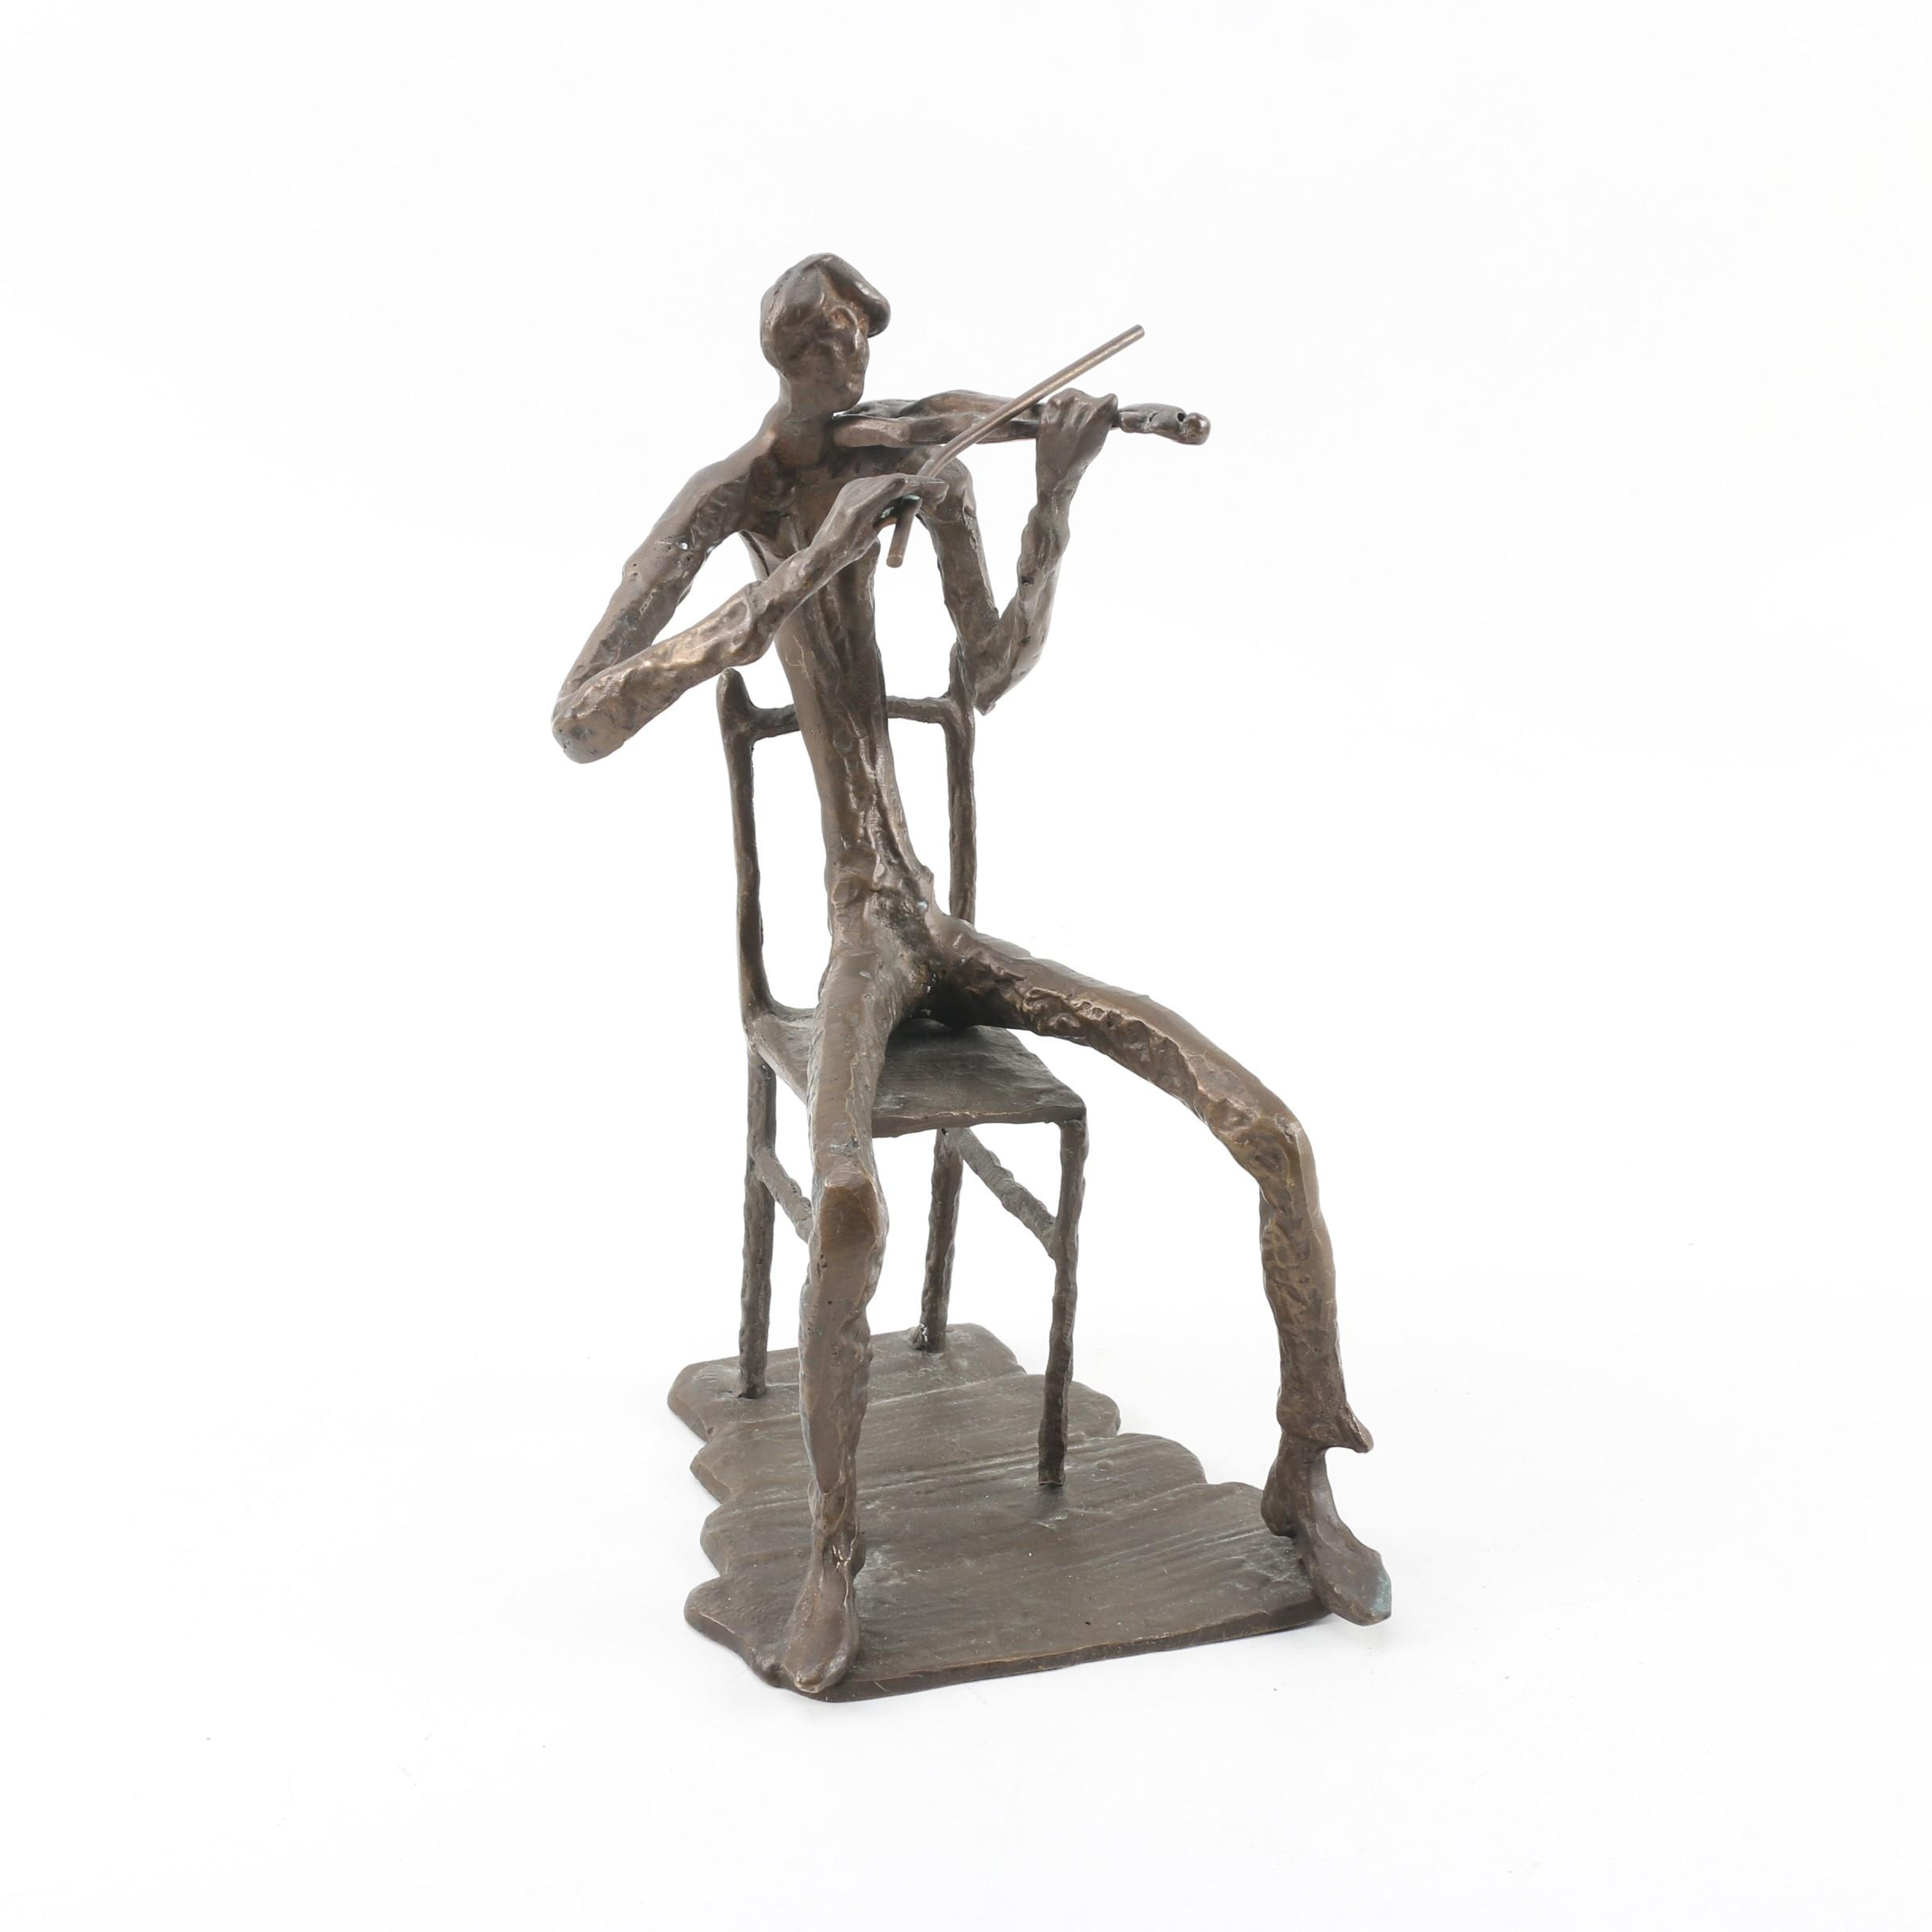 Metal Sculpture of a Violin Player